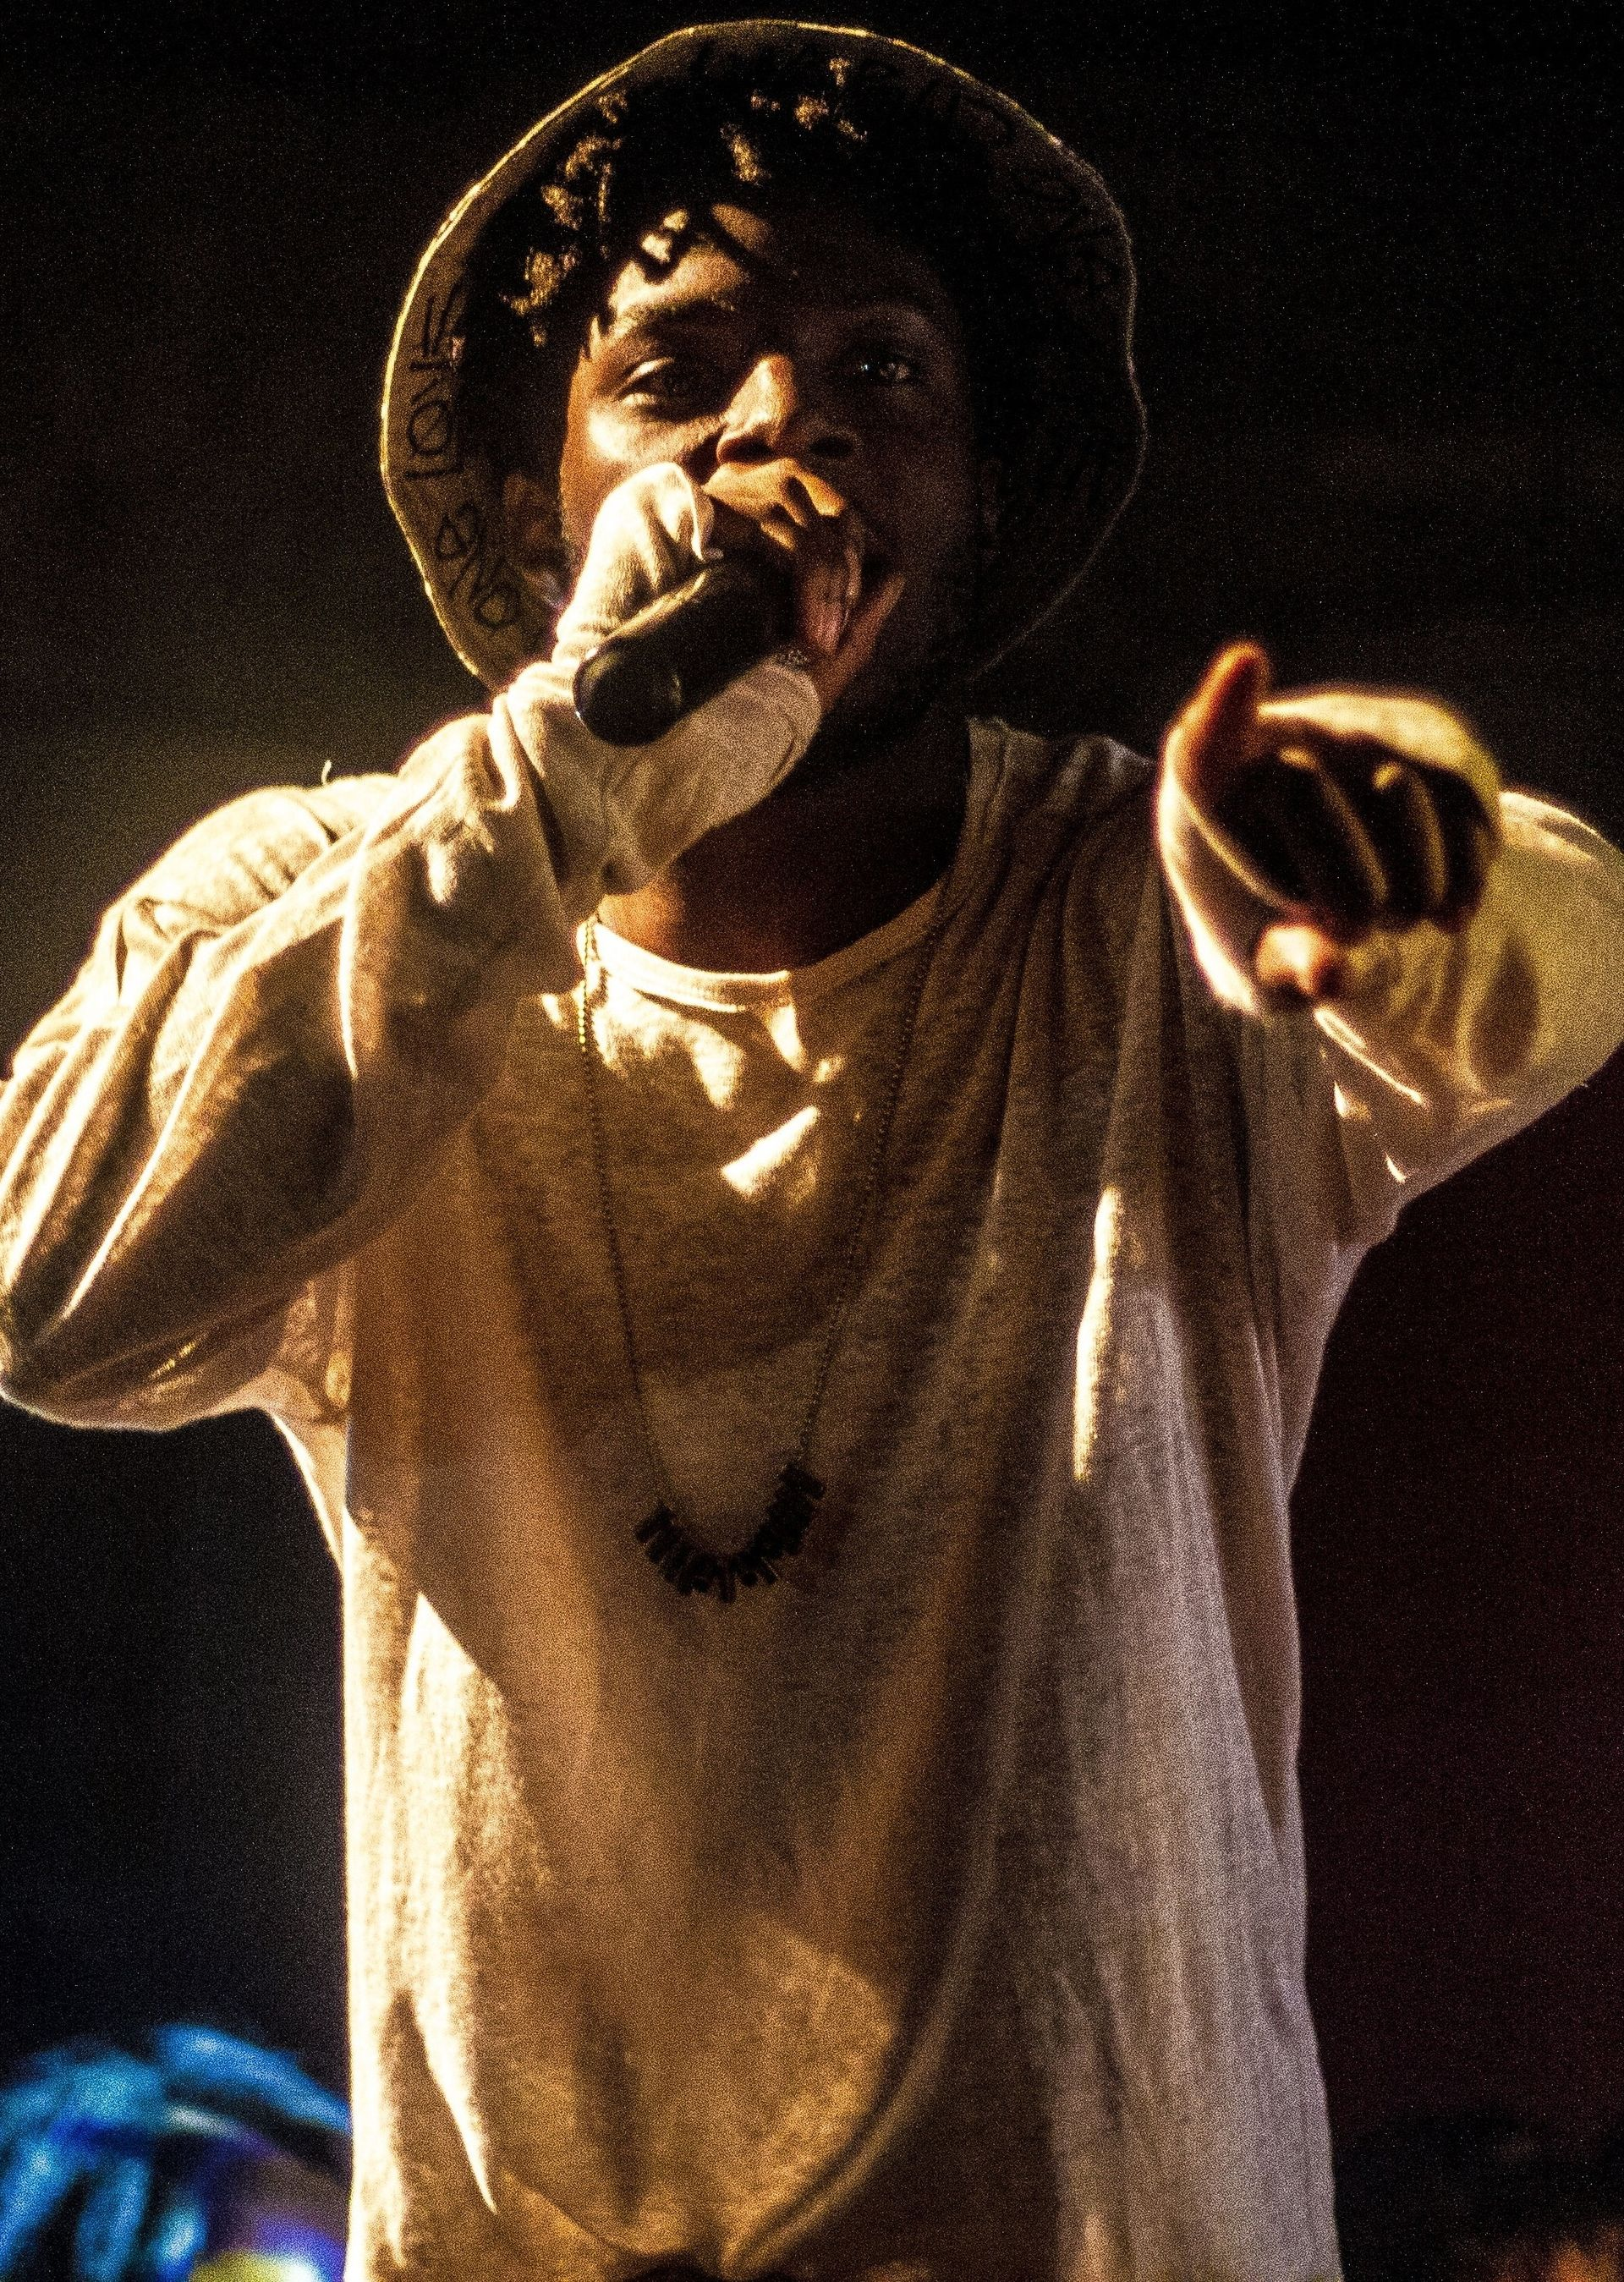 isaiah rashad discography wikipedia